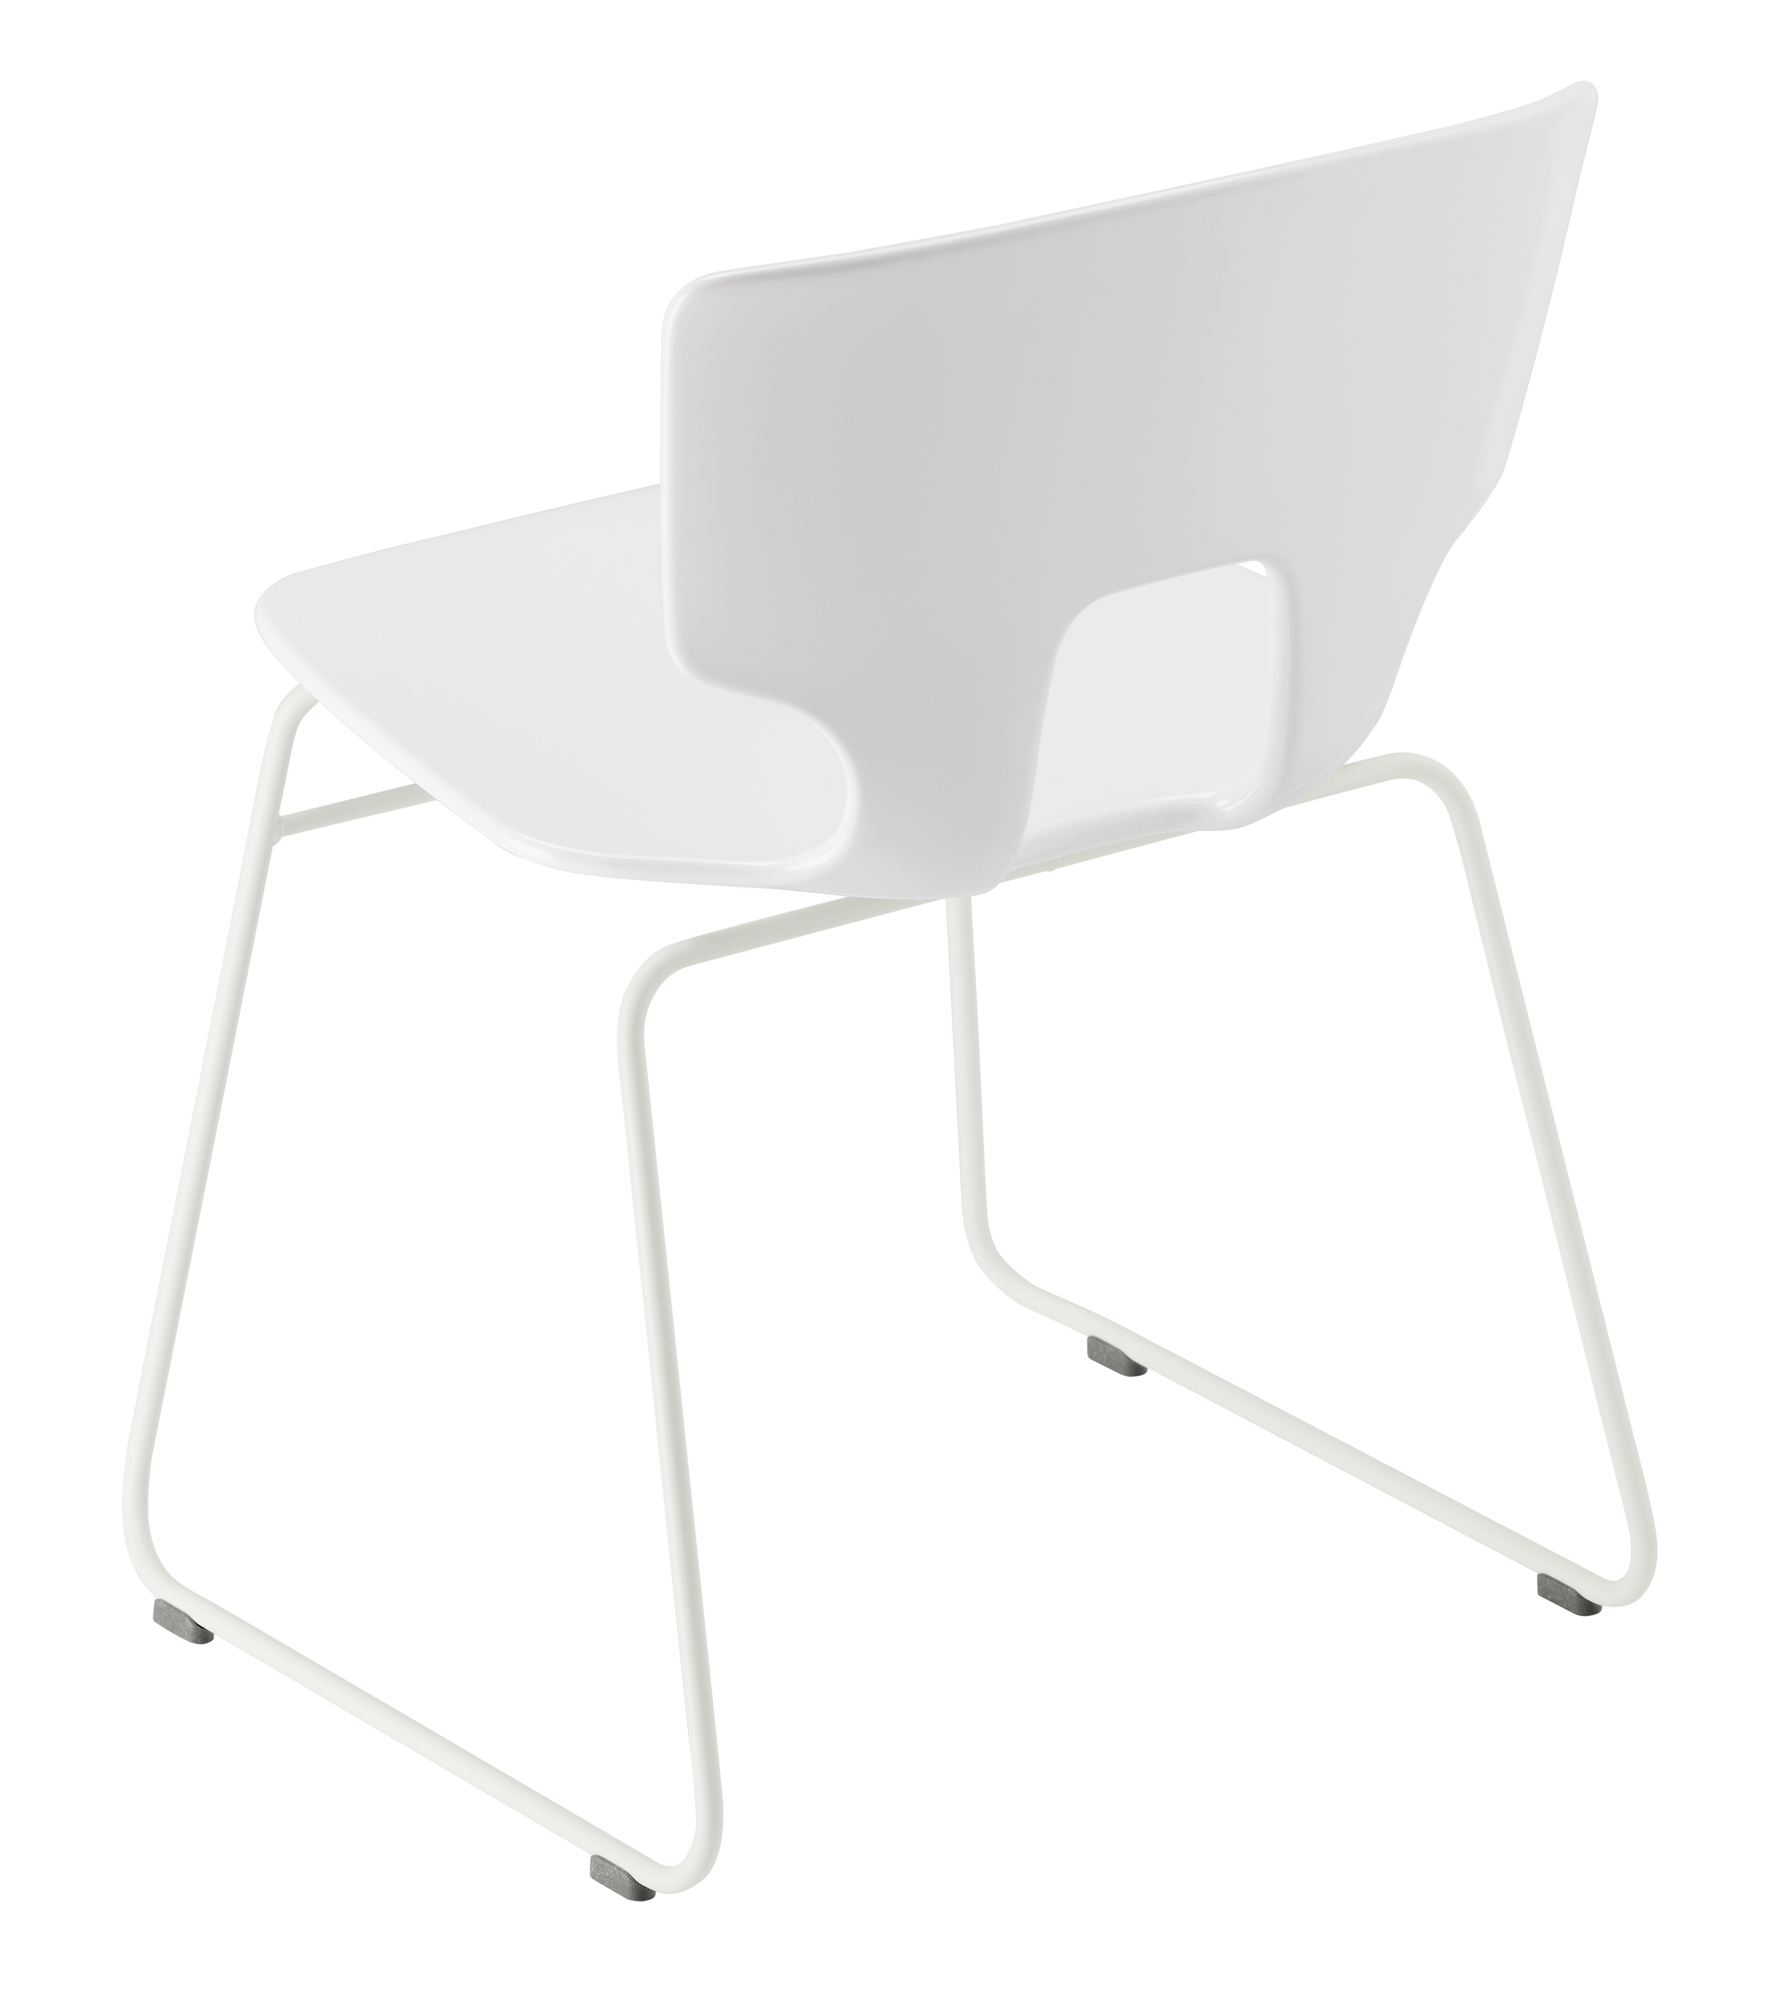 erice chair sledge.jpg